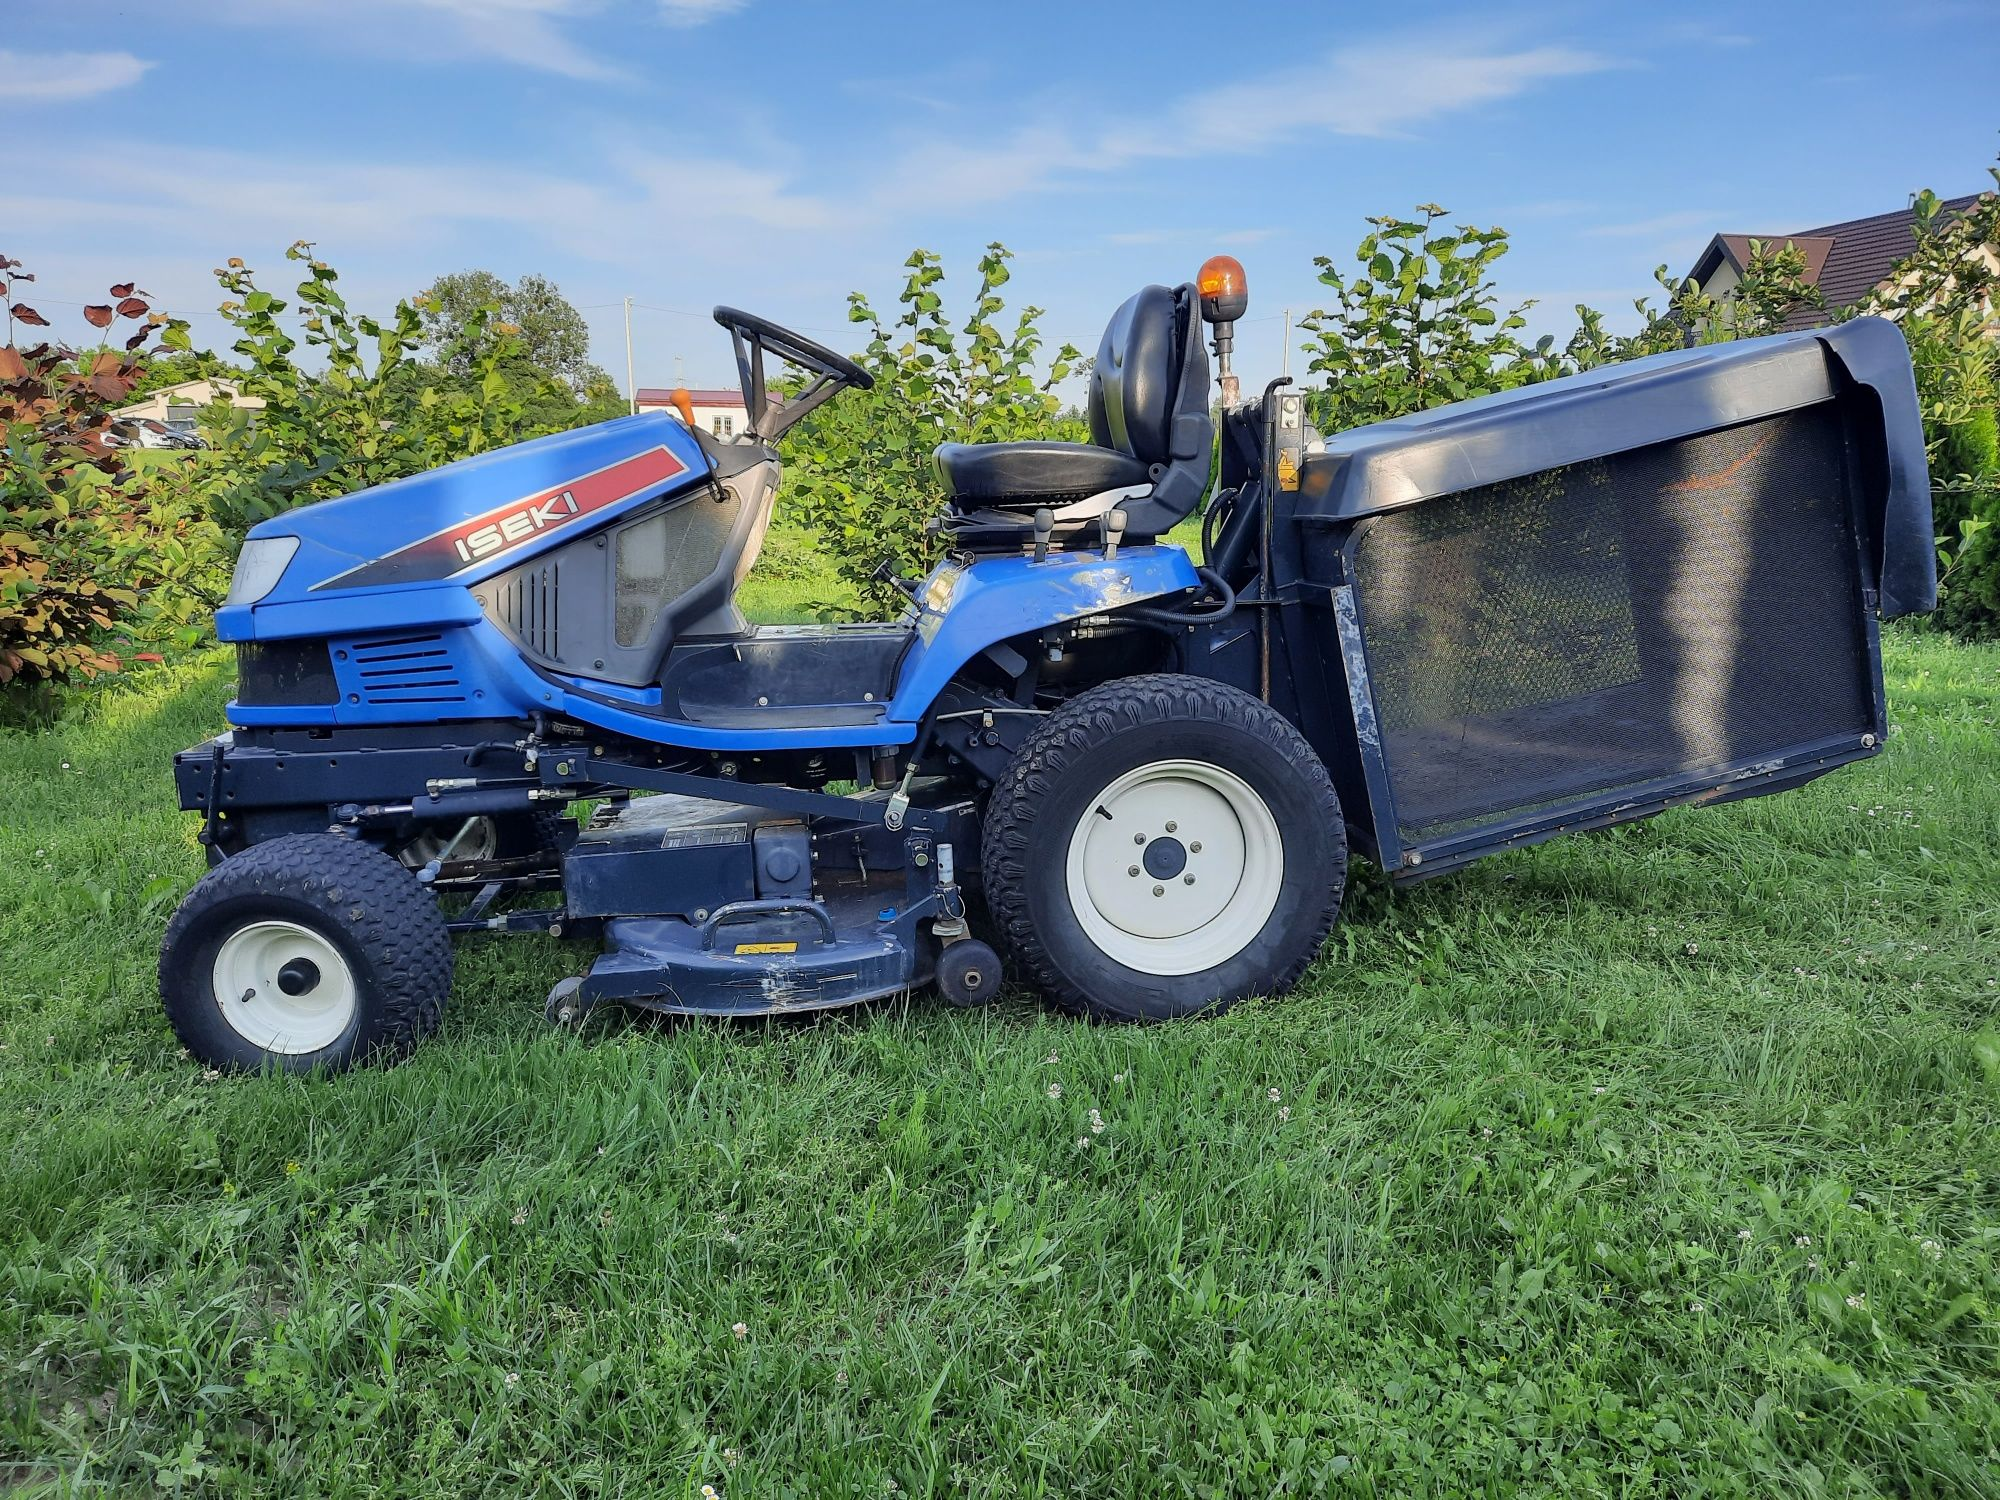 Profesjonalny Traktorek Kosiarka Iseki SXG22 Diesel 3cyl 636h 22KM